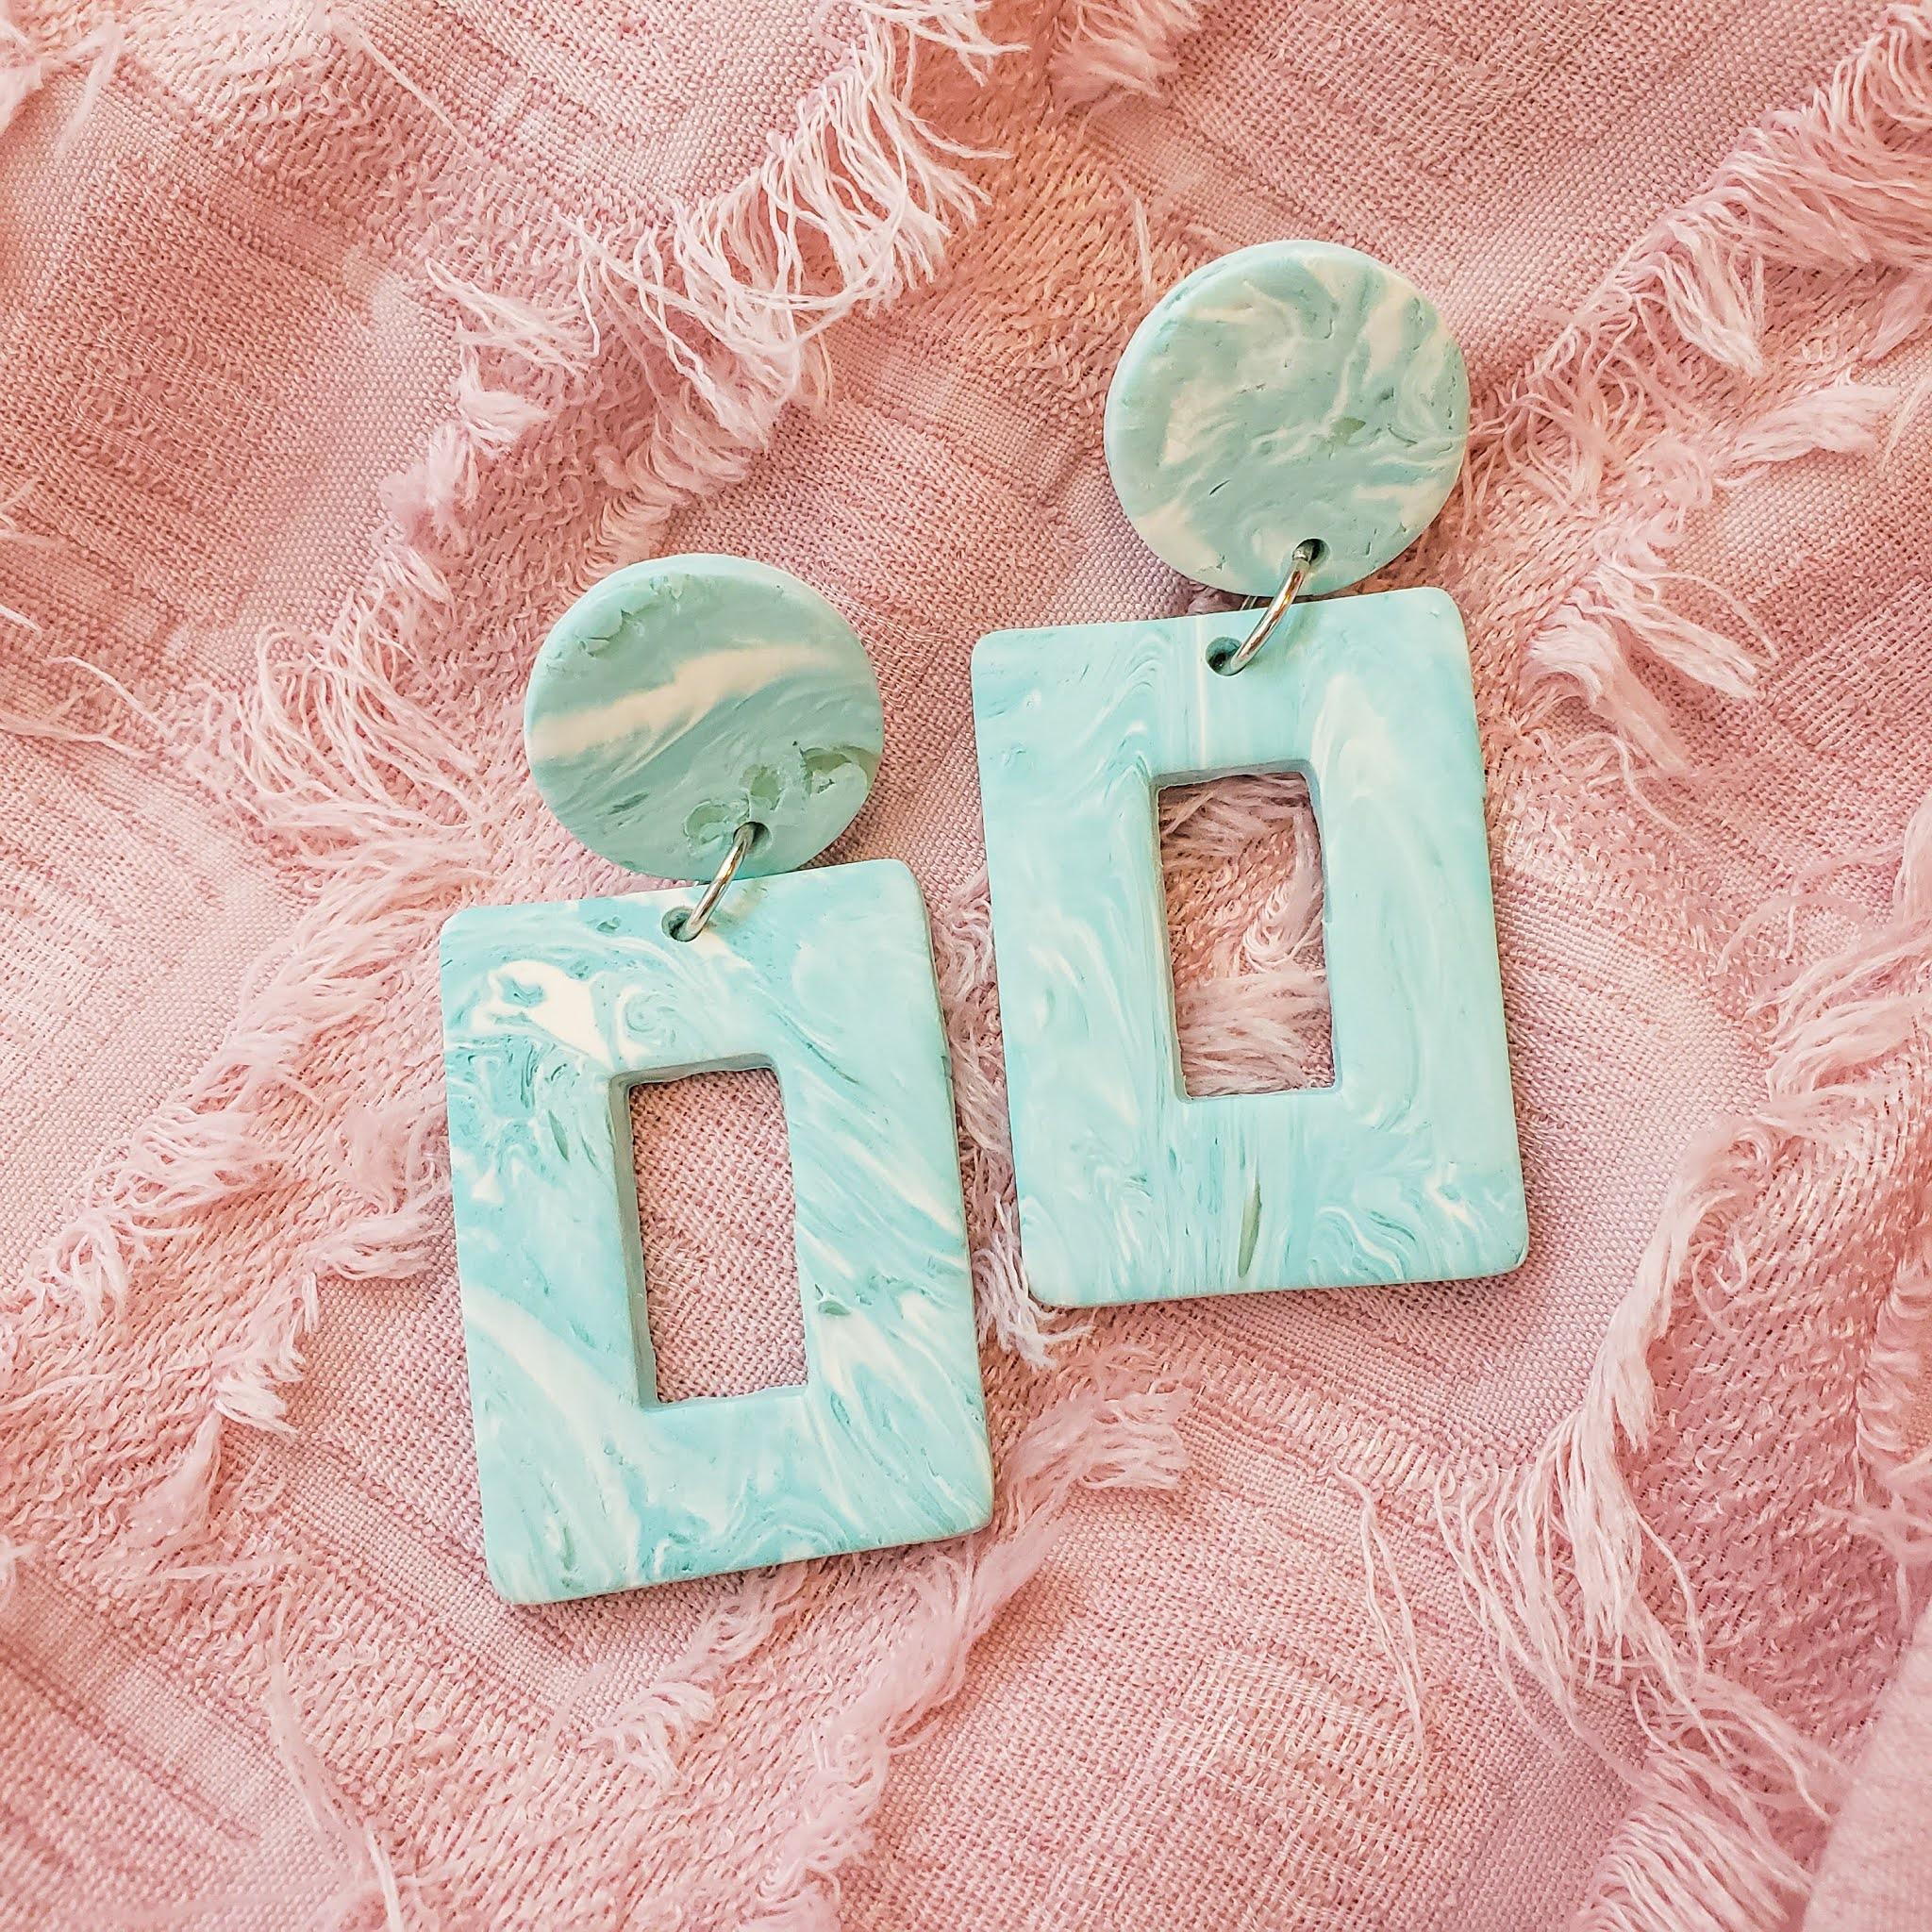 Handmade polymer clay statement earrings - layla drops